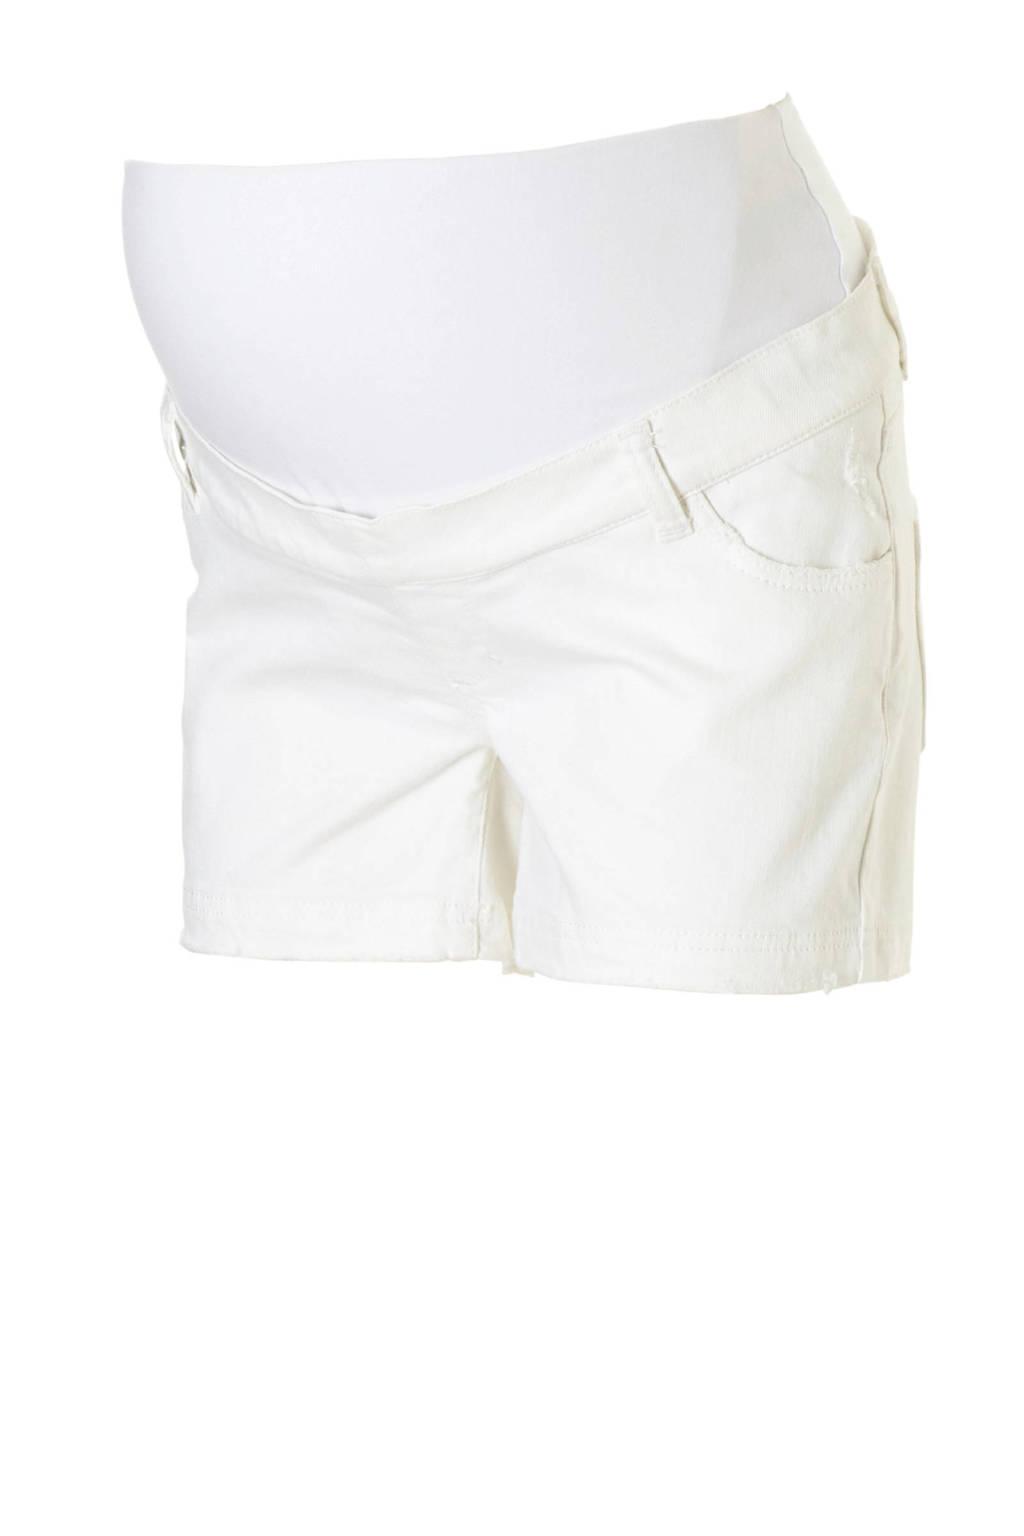 GeBe Maternity zwangerschaps jeans short Dimisa wit, Wit